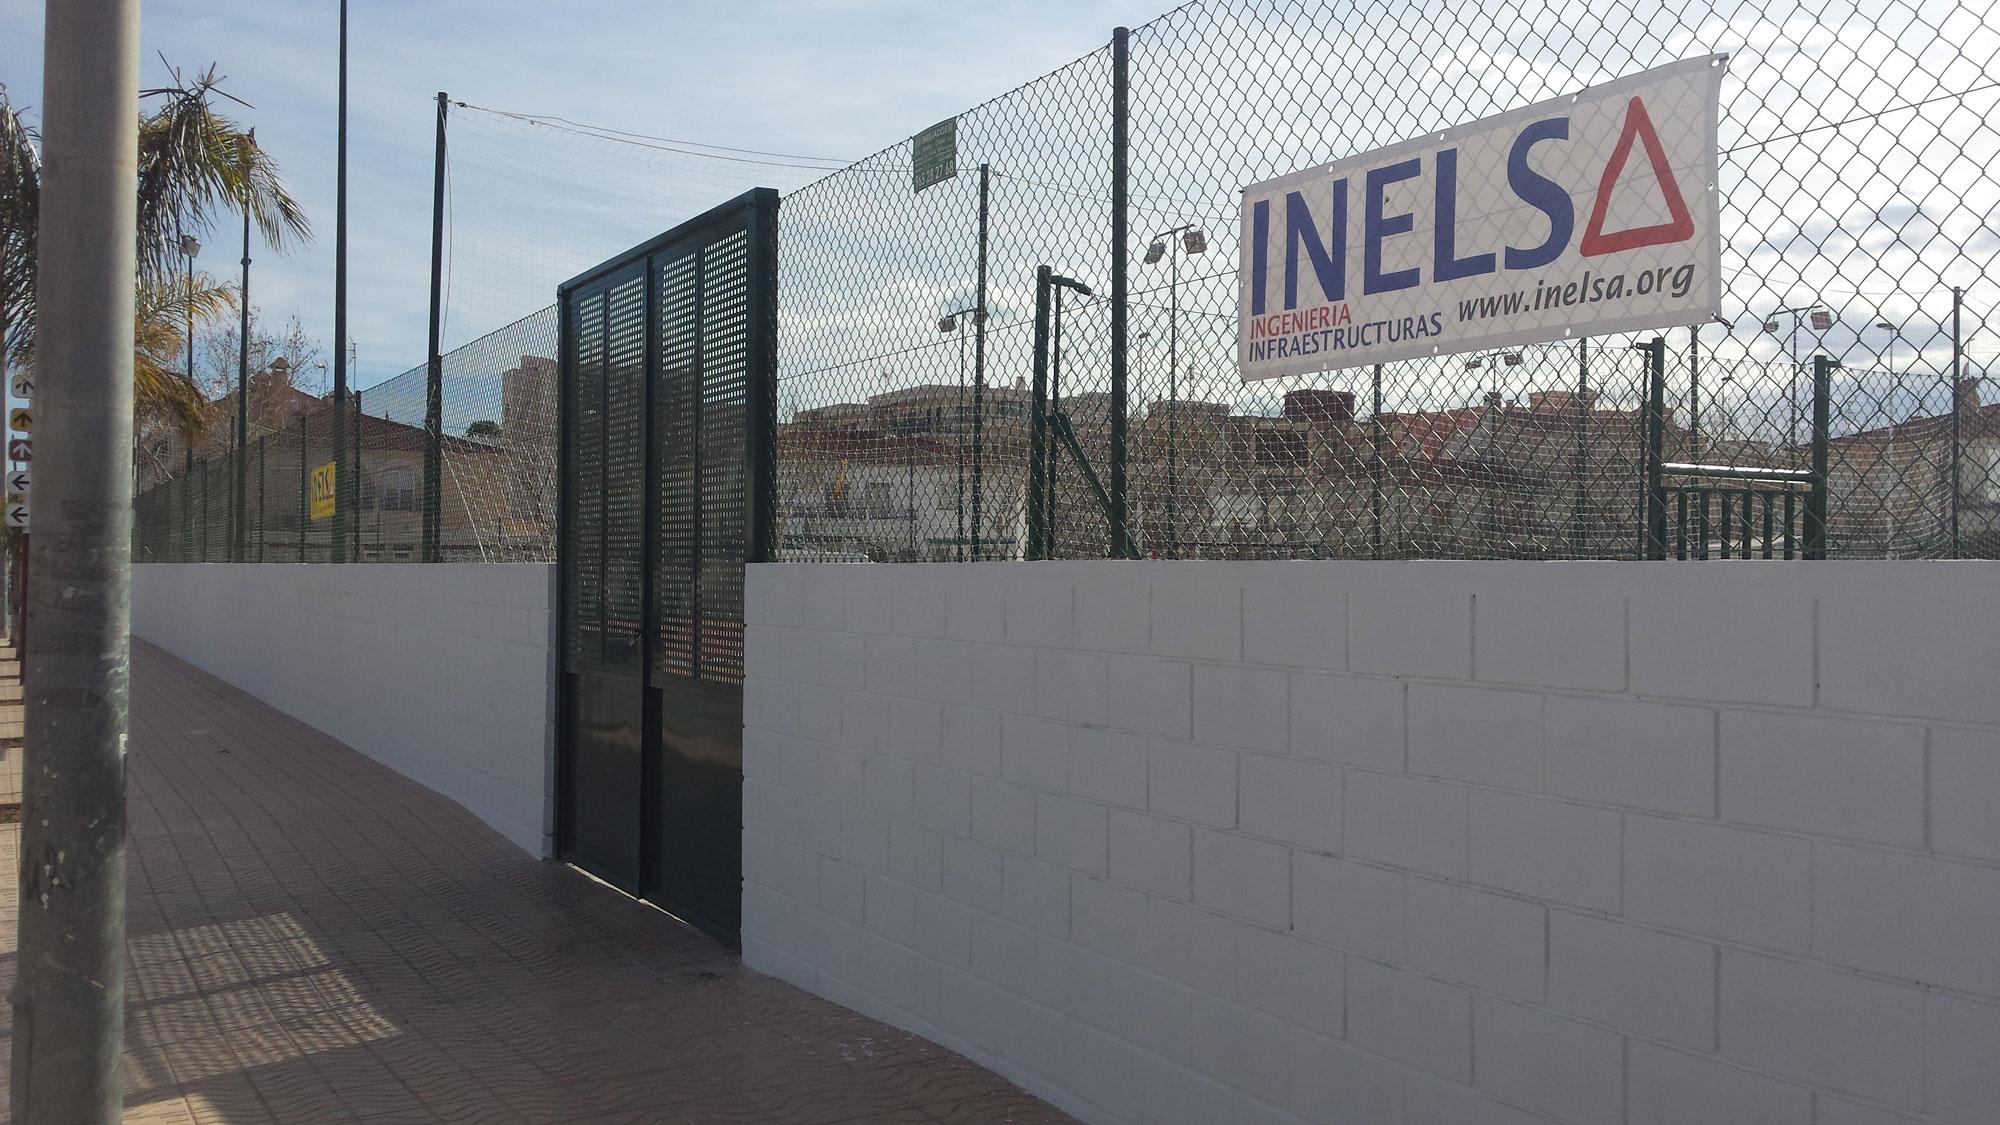 Inelsa empresa de construcci n en alicante construccion for Malla de construccion